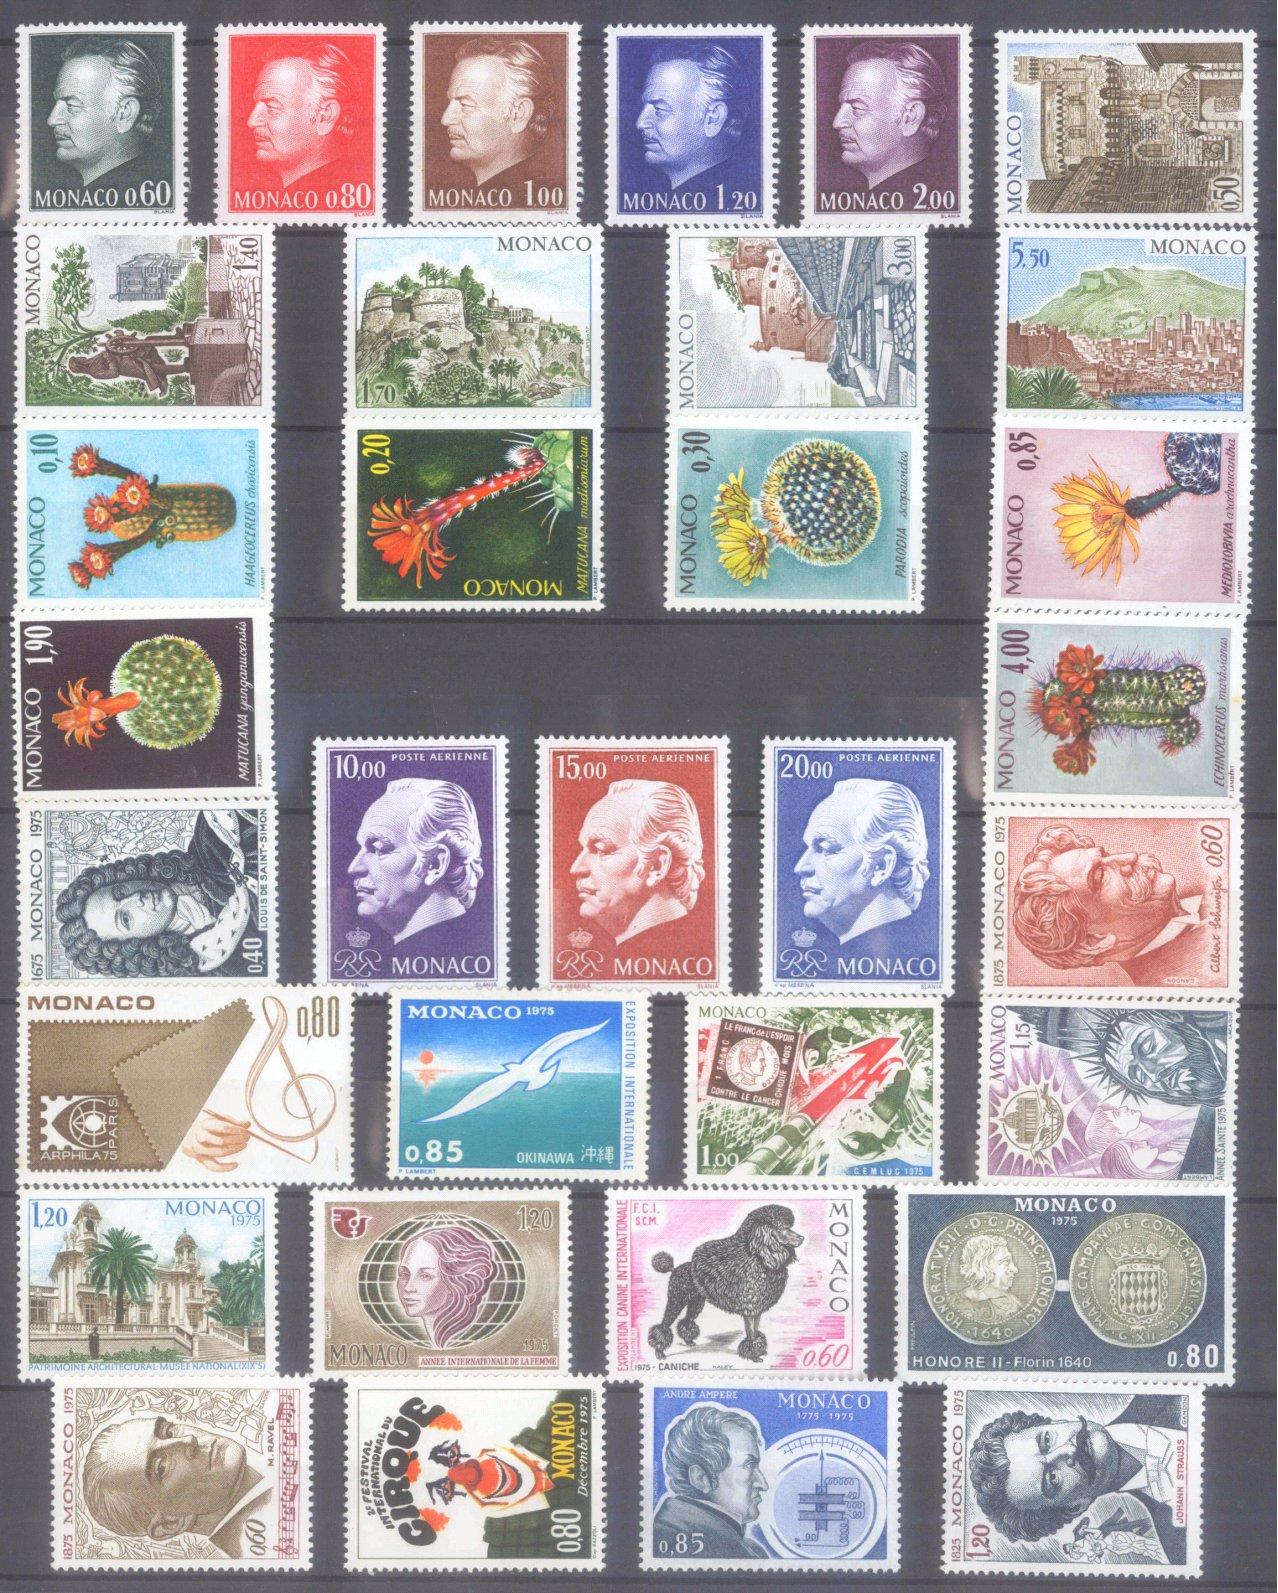 MONACO 1953-1989, Katalogwert 970,- Euro-9